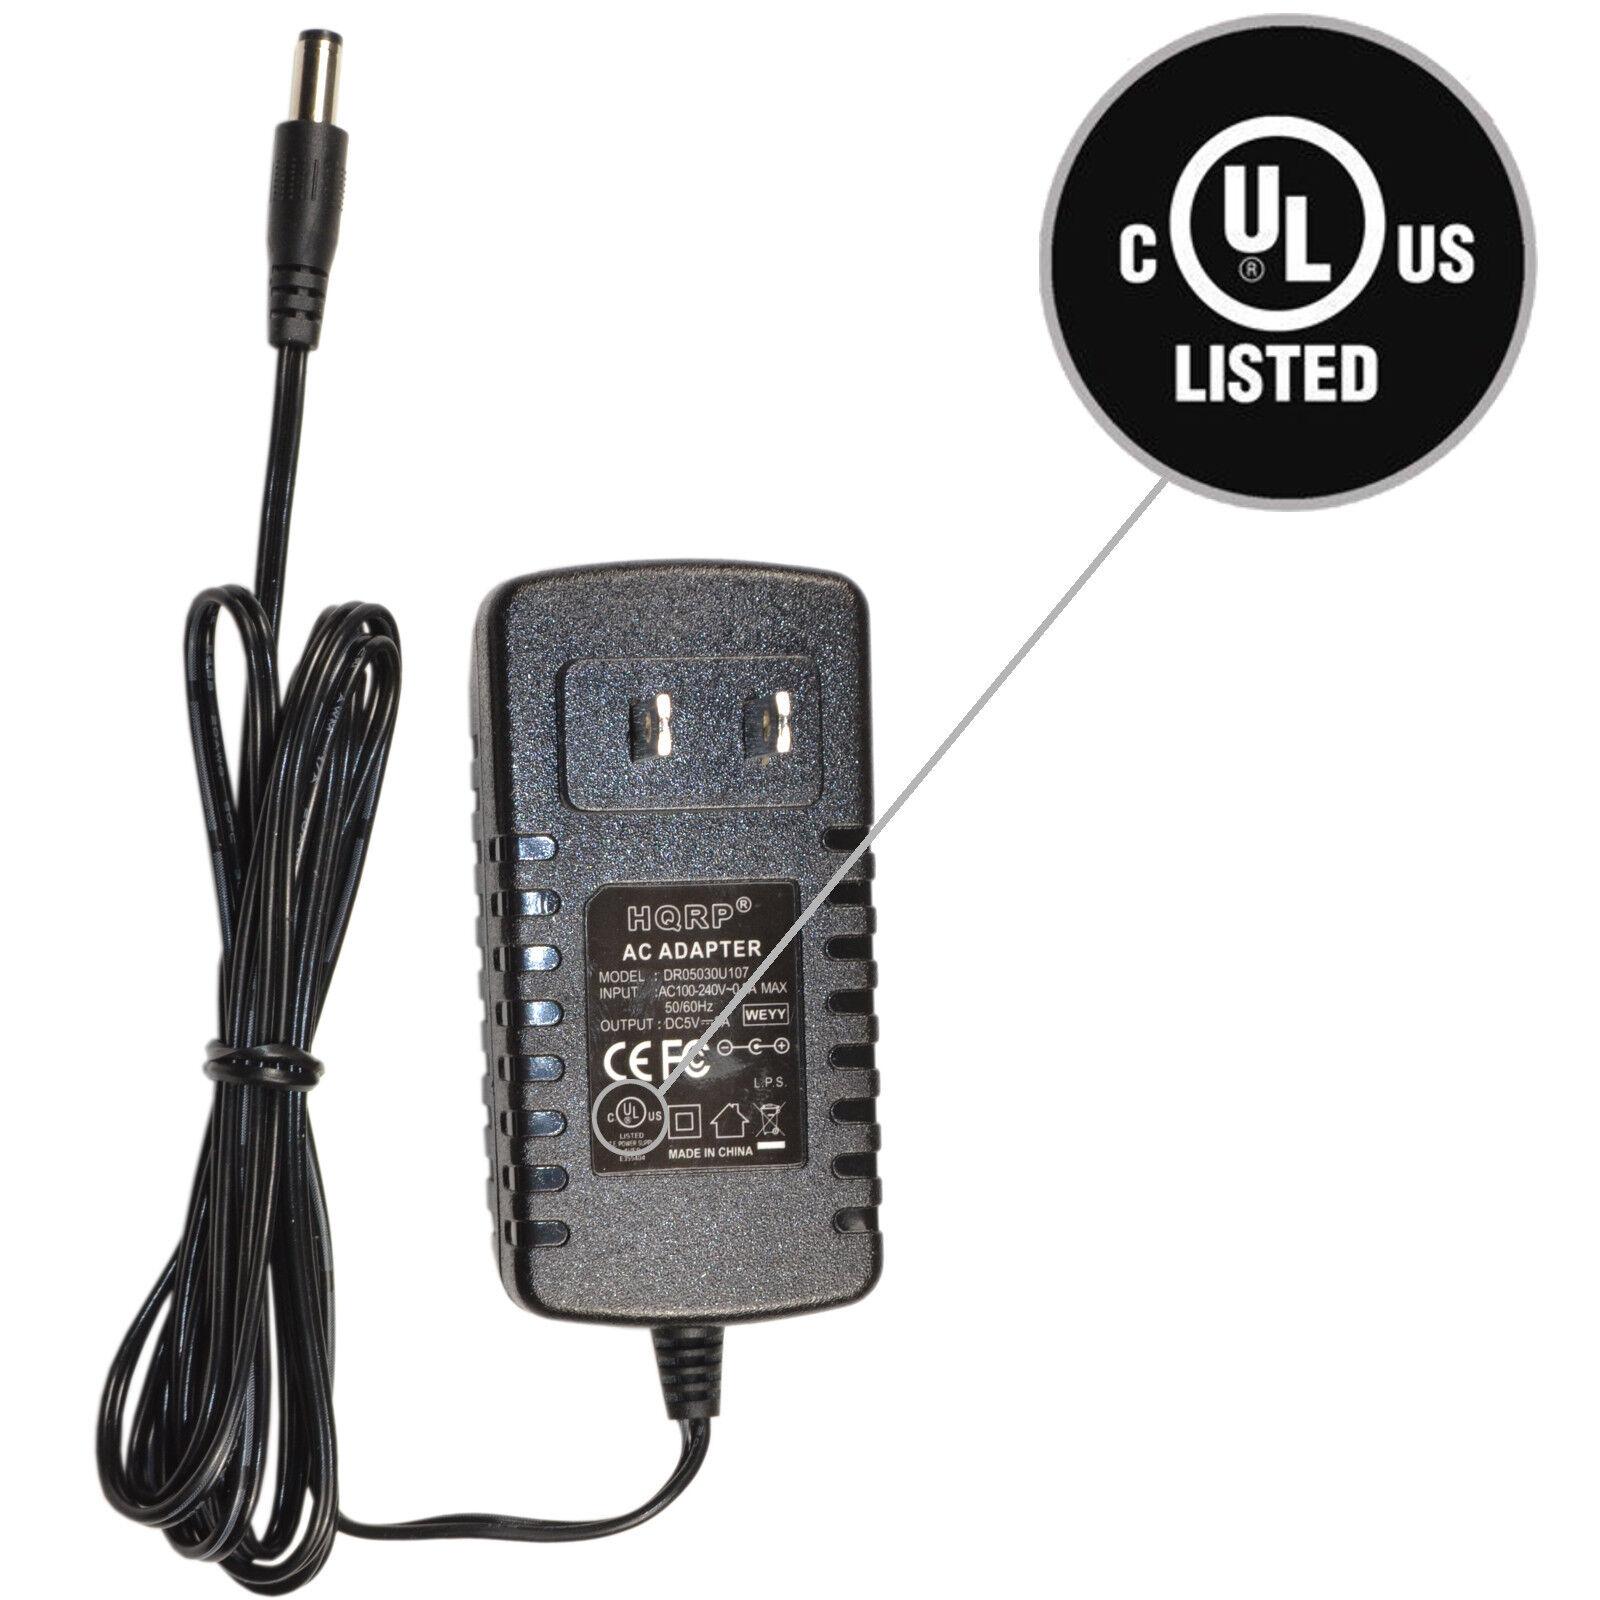 HQRP Antena amplificadora inalámbrica para D-Link WBR-2310 DIR-625